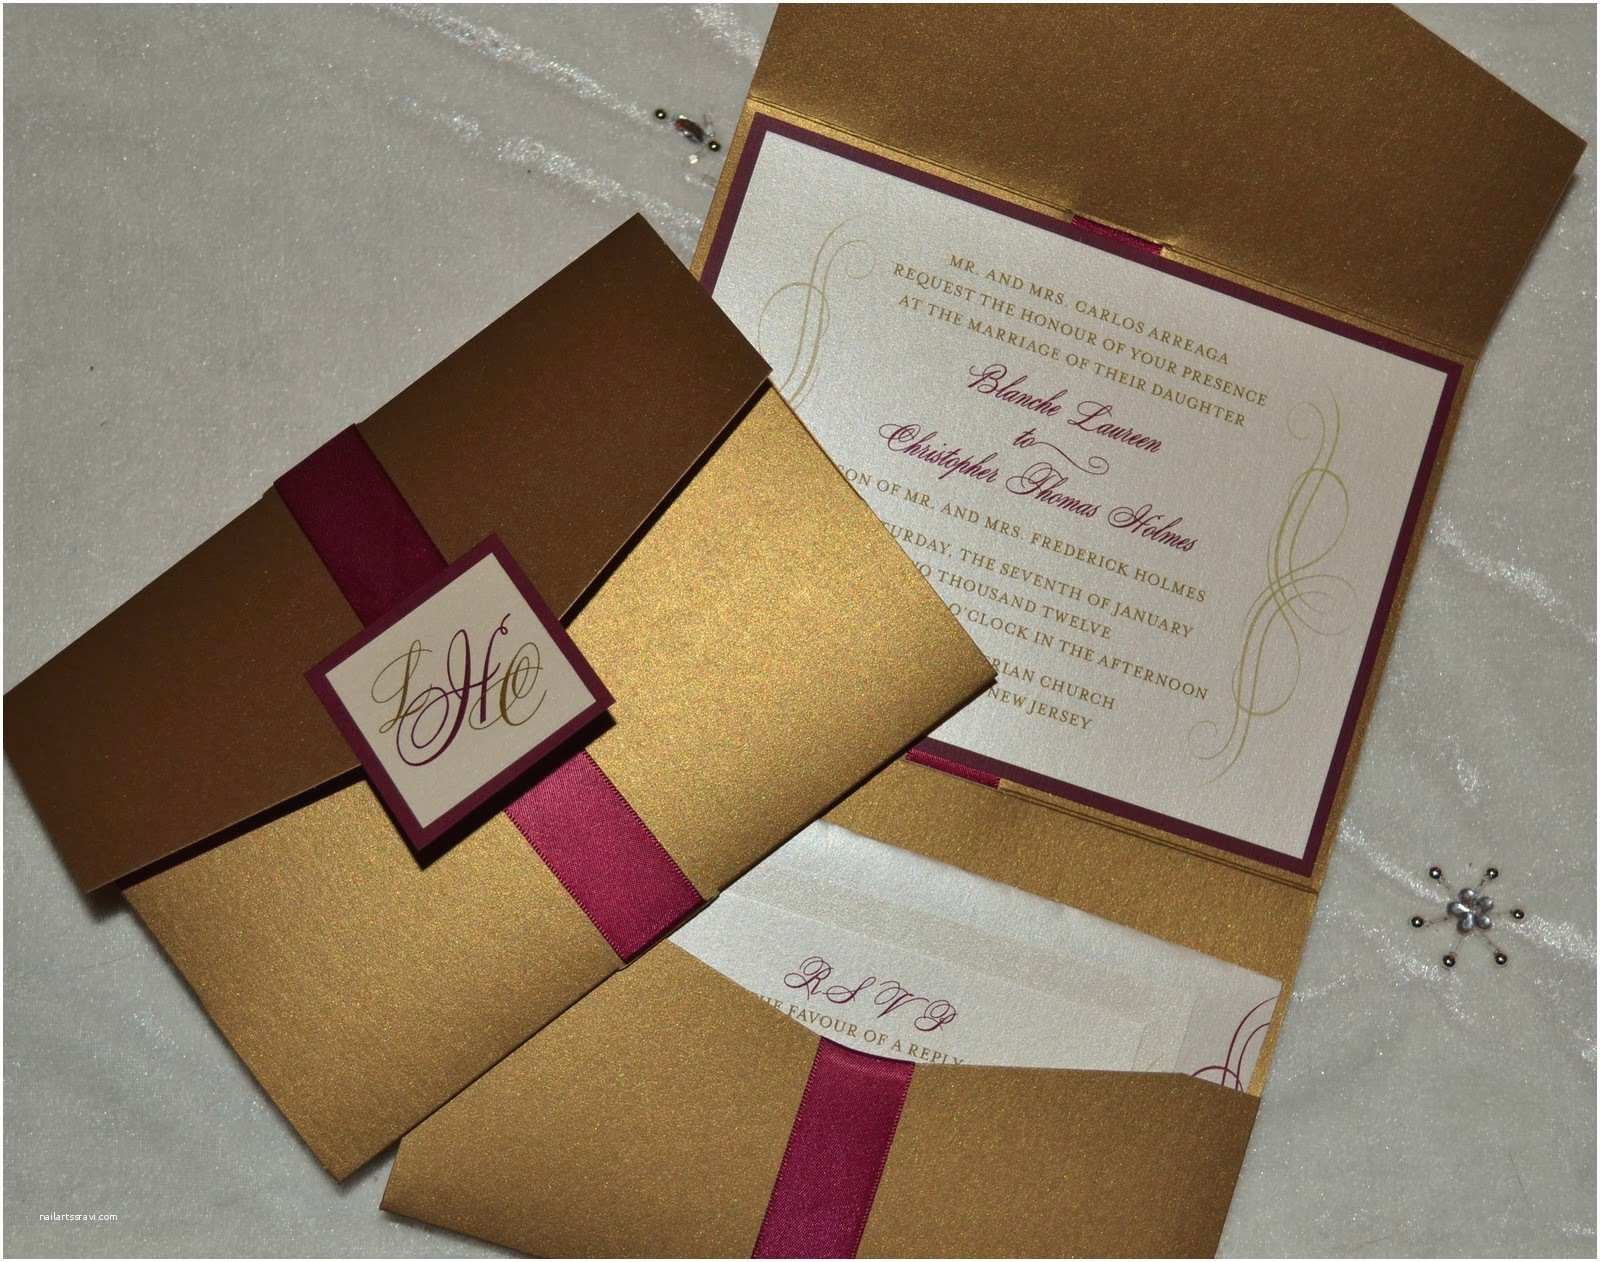 Burgundy and Gold Wedding Invitations Jar Of Ideas Laureen & Chris Gold and Burgundy Wedding